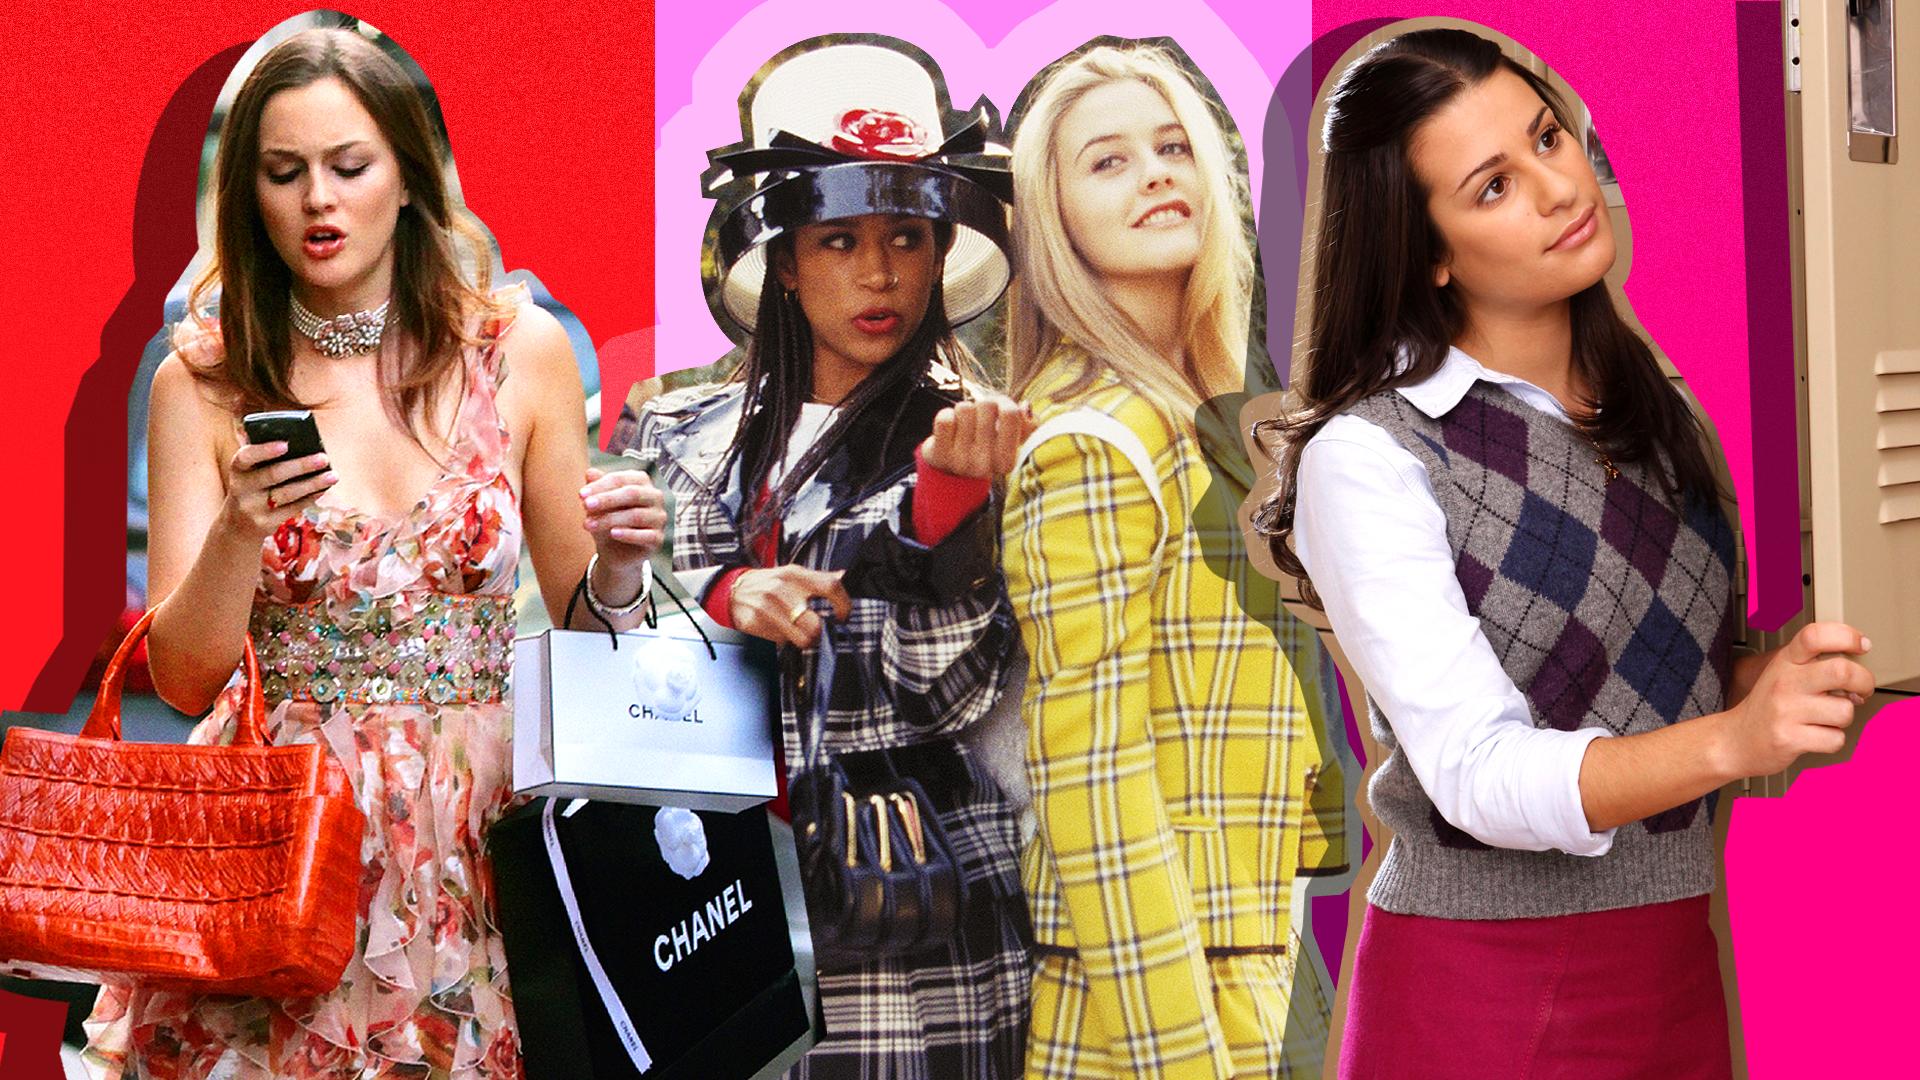 Fashionable High School Characters